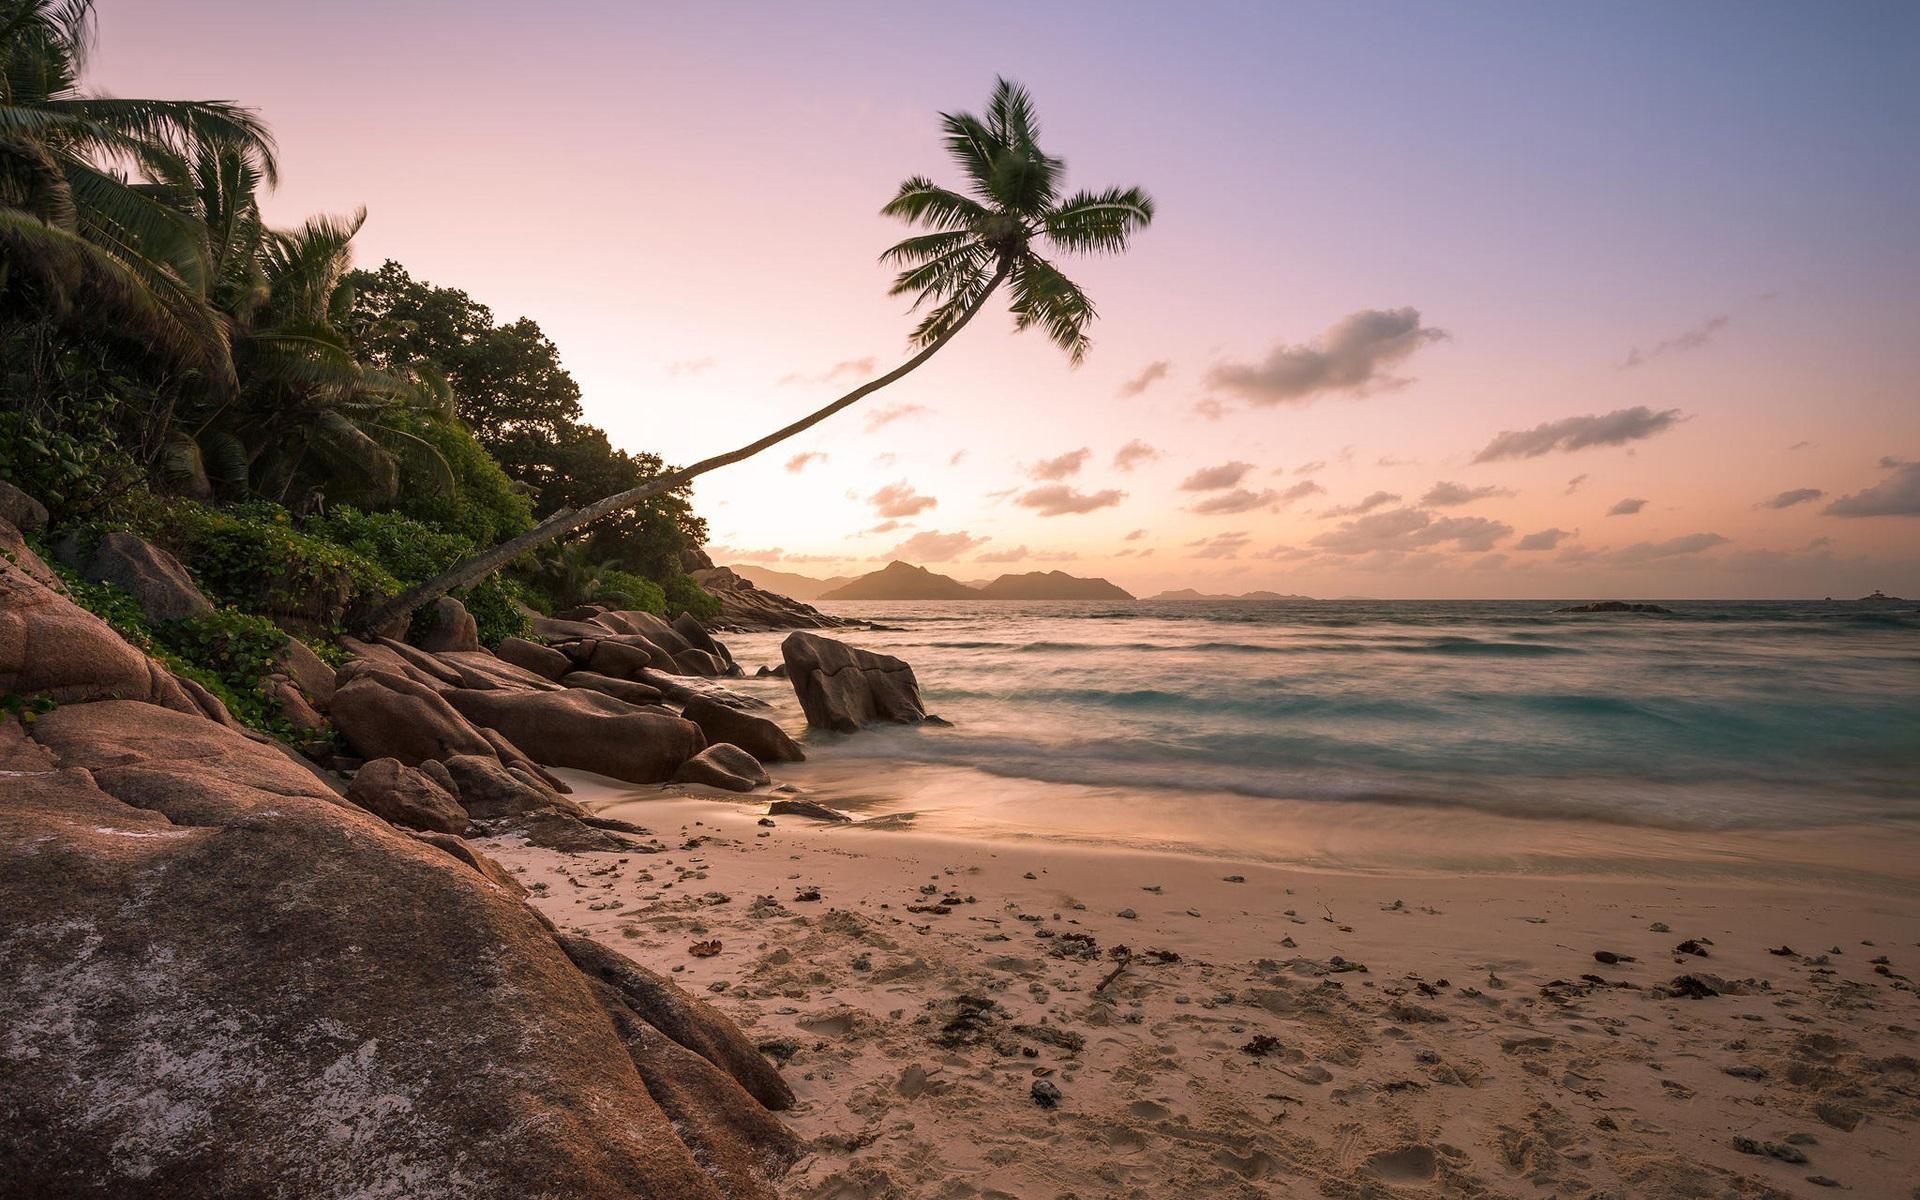 Wallpaper Caribbean Sea Beach Sunset Palm Trees Hd 5k: 壁紙 ビーチ、海岸、ヤシの木、海、夕日 1920x1200 HD 無料のデスクトップの背景, 画像